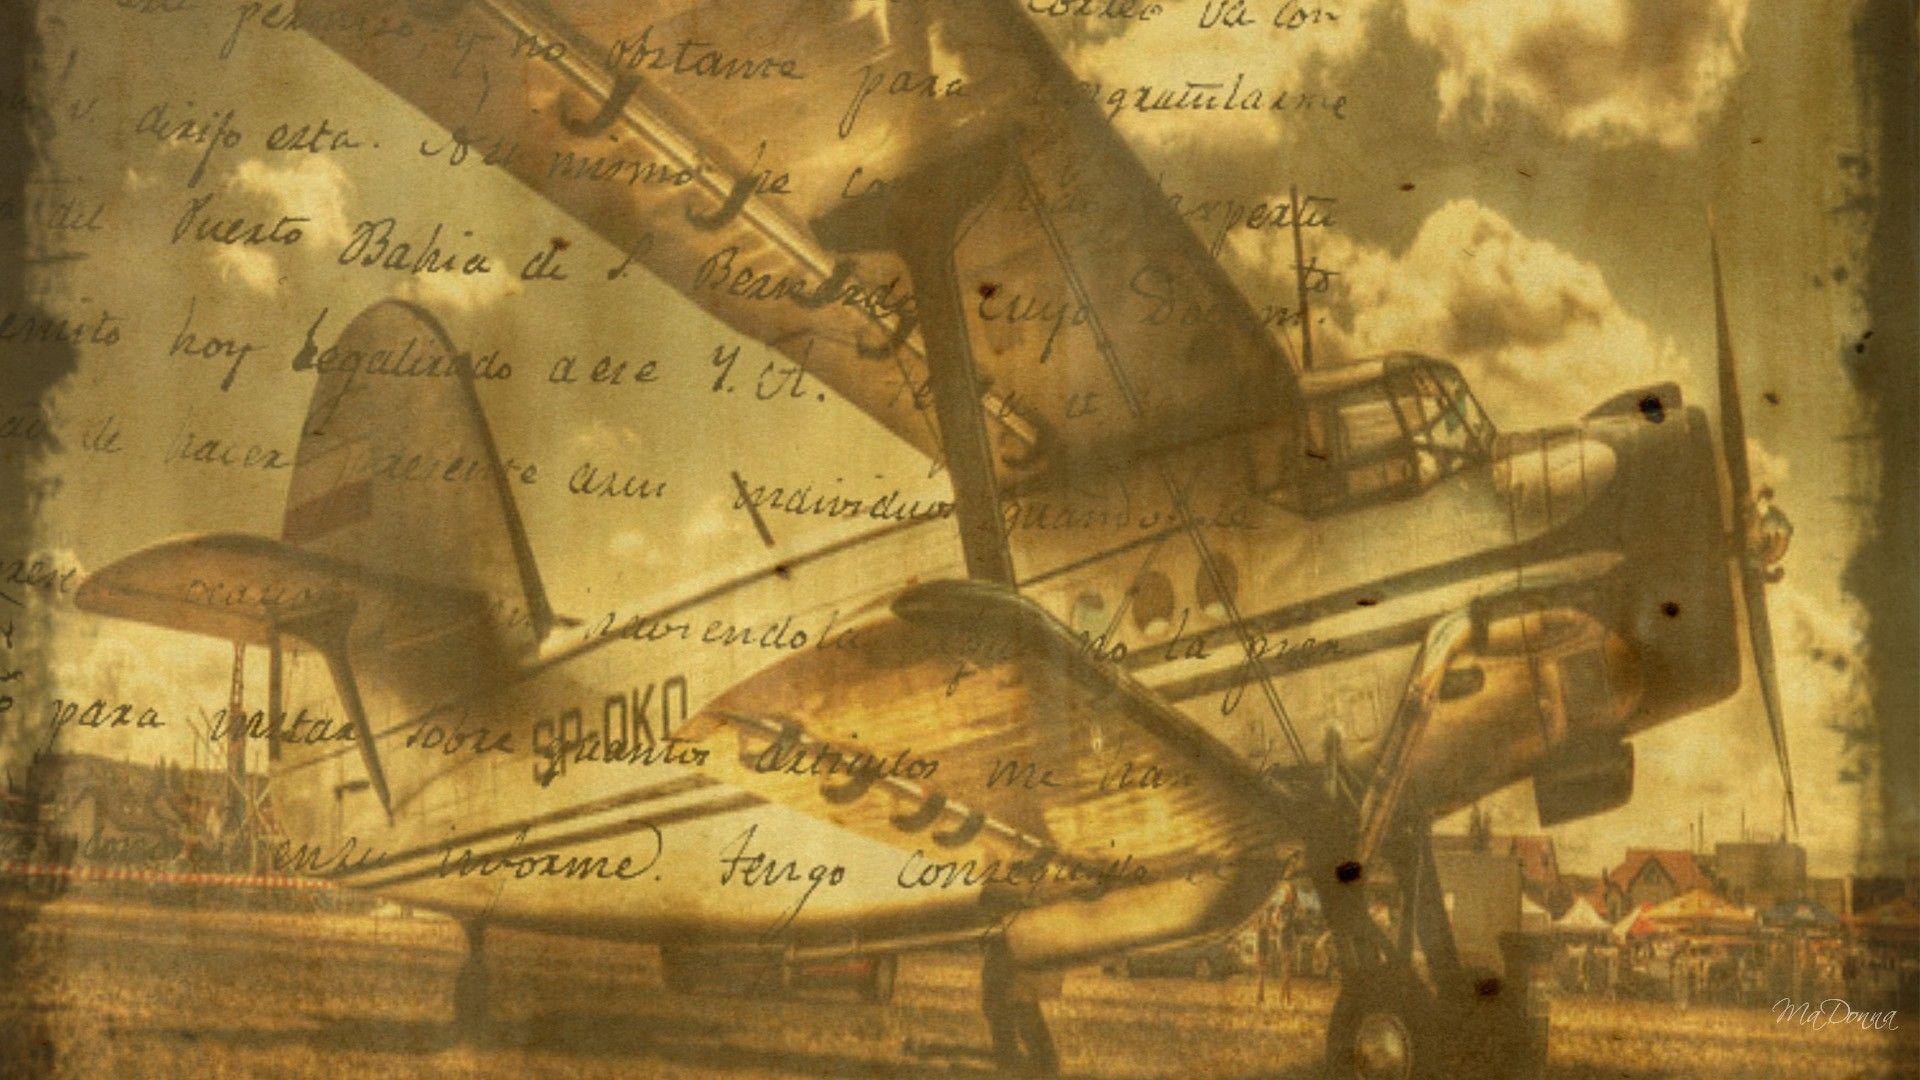 Vintage Airplane Wallpapers 1920x1080